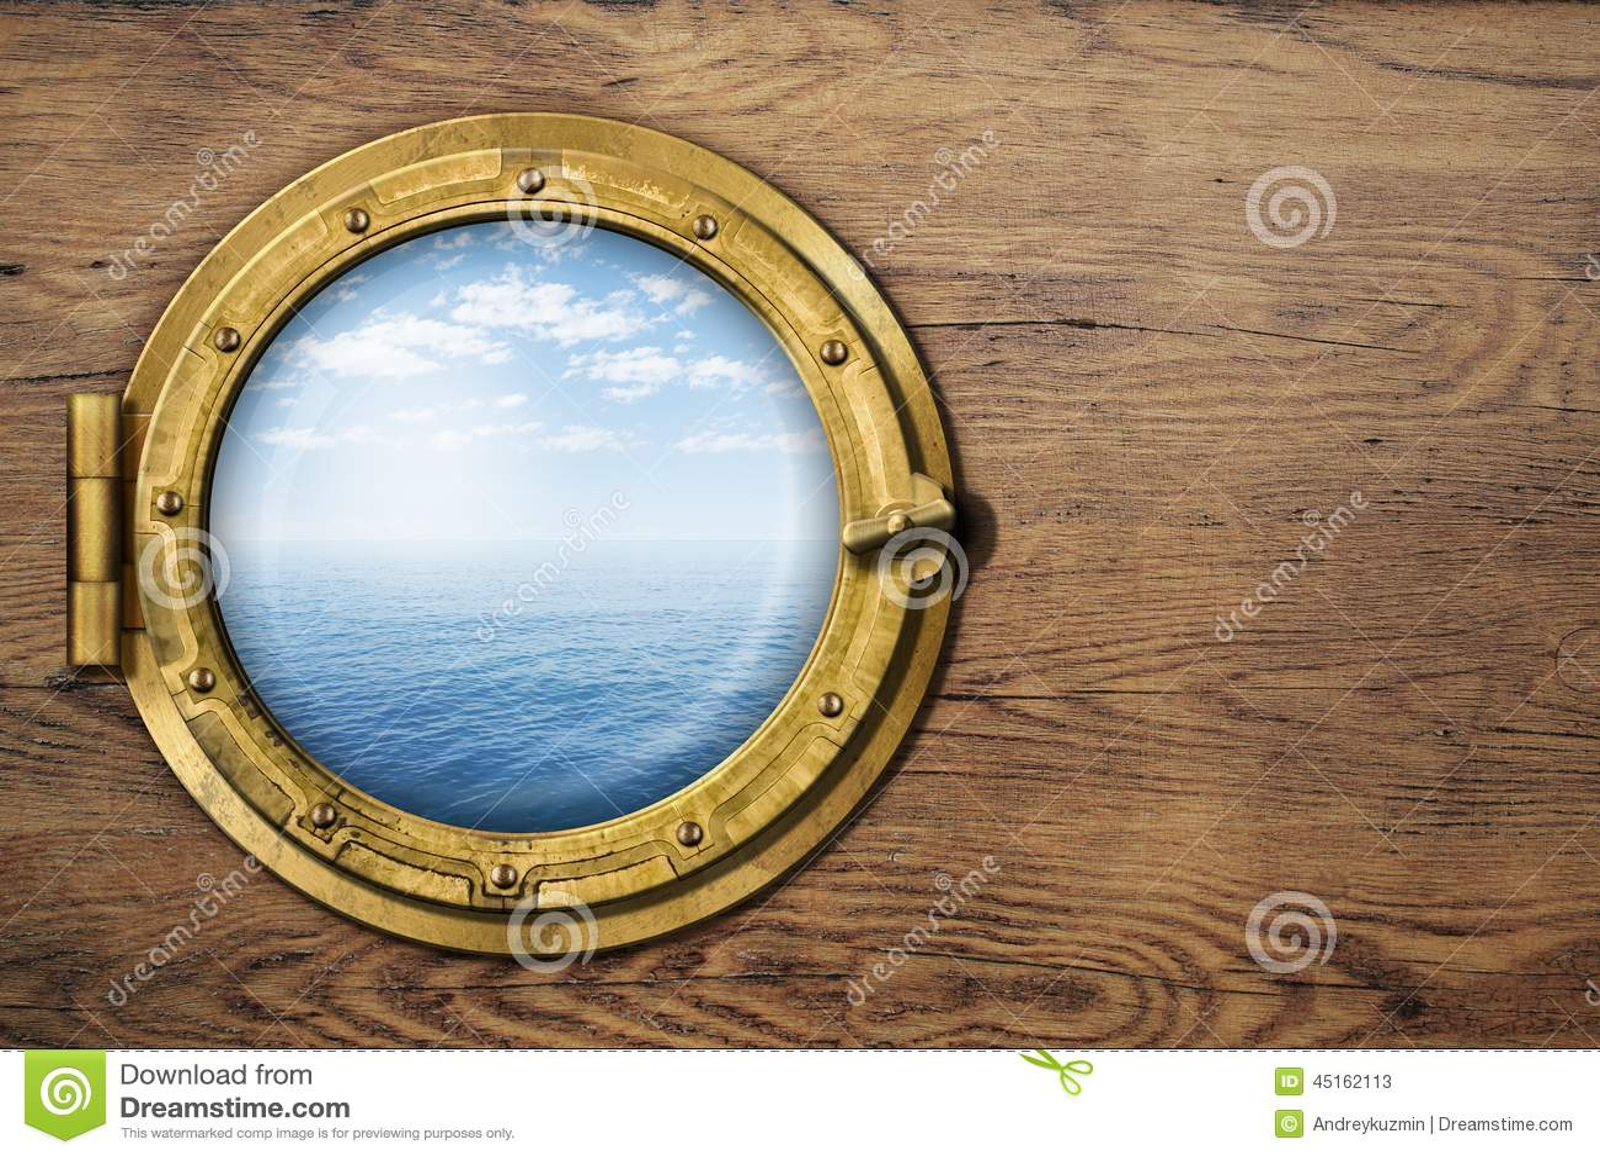 Ship Or Boat Porthole On Wooden Wall Stock Image - Image: 45162113